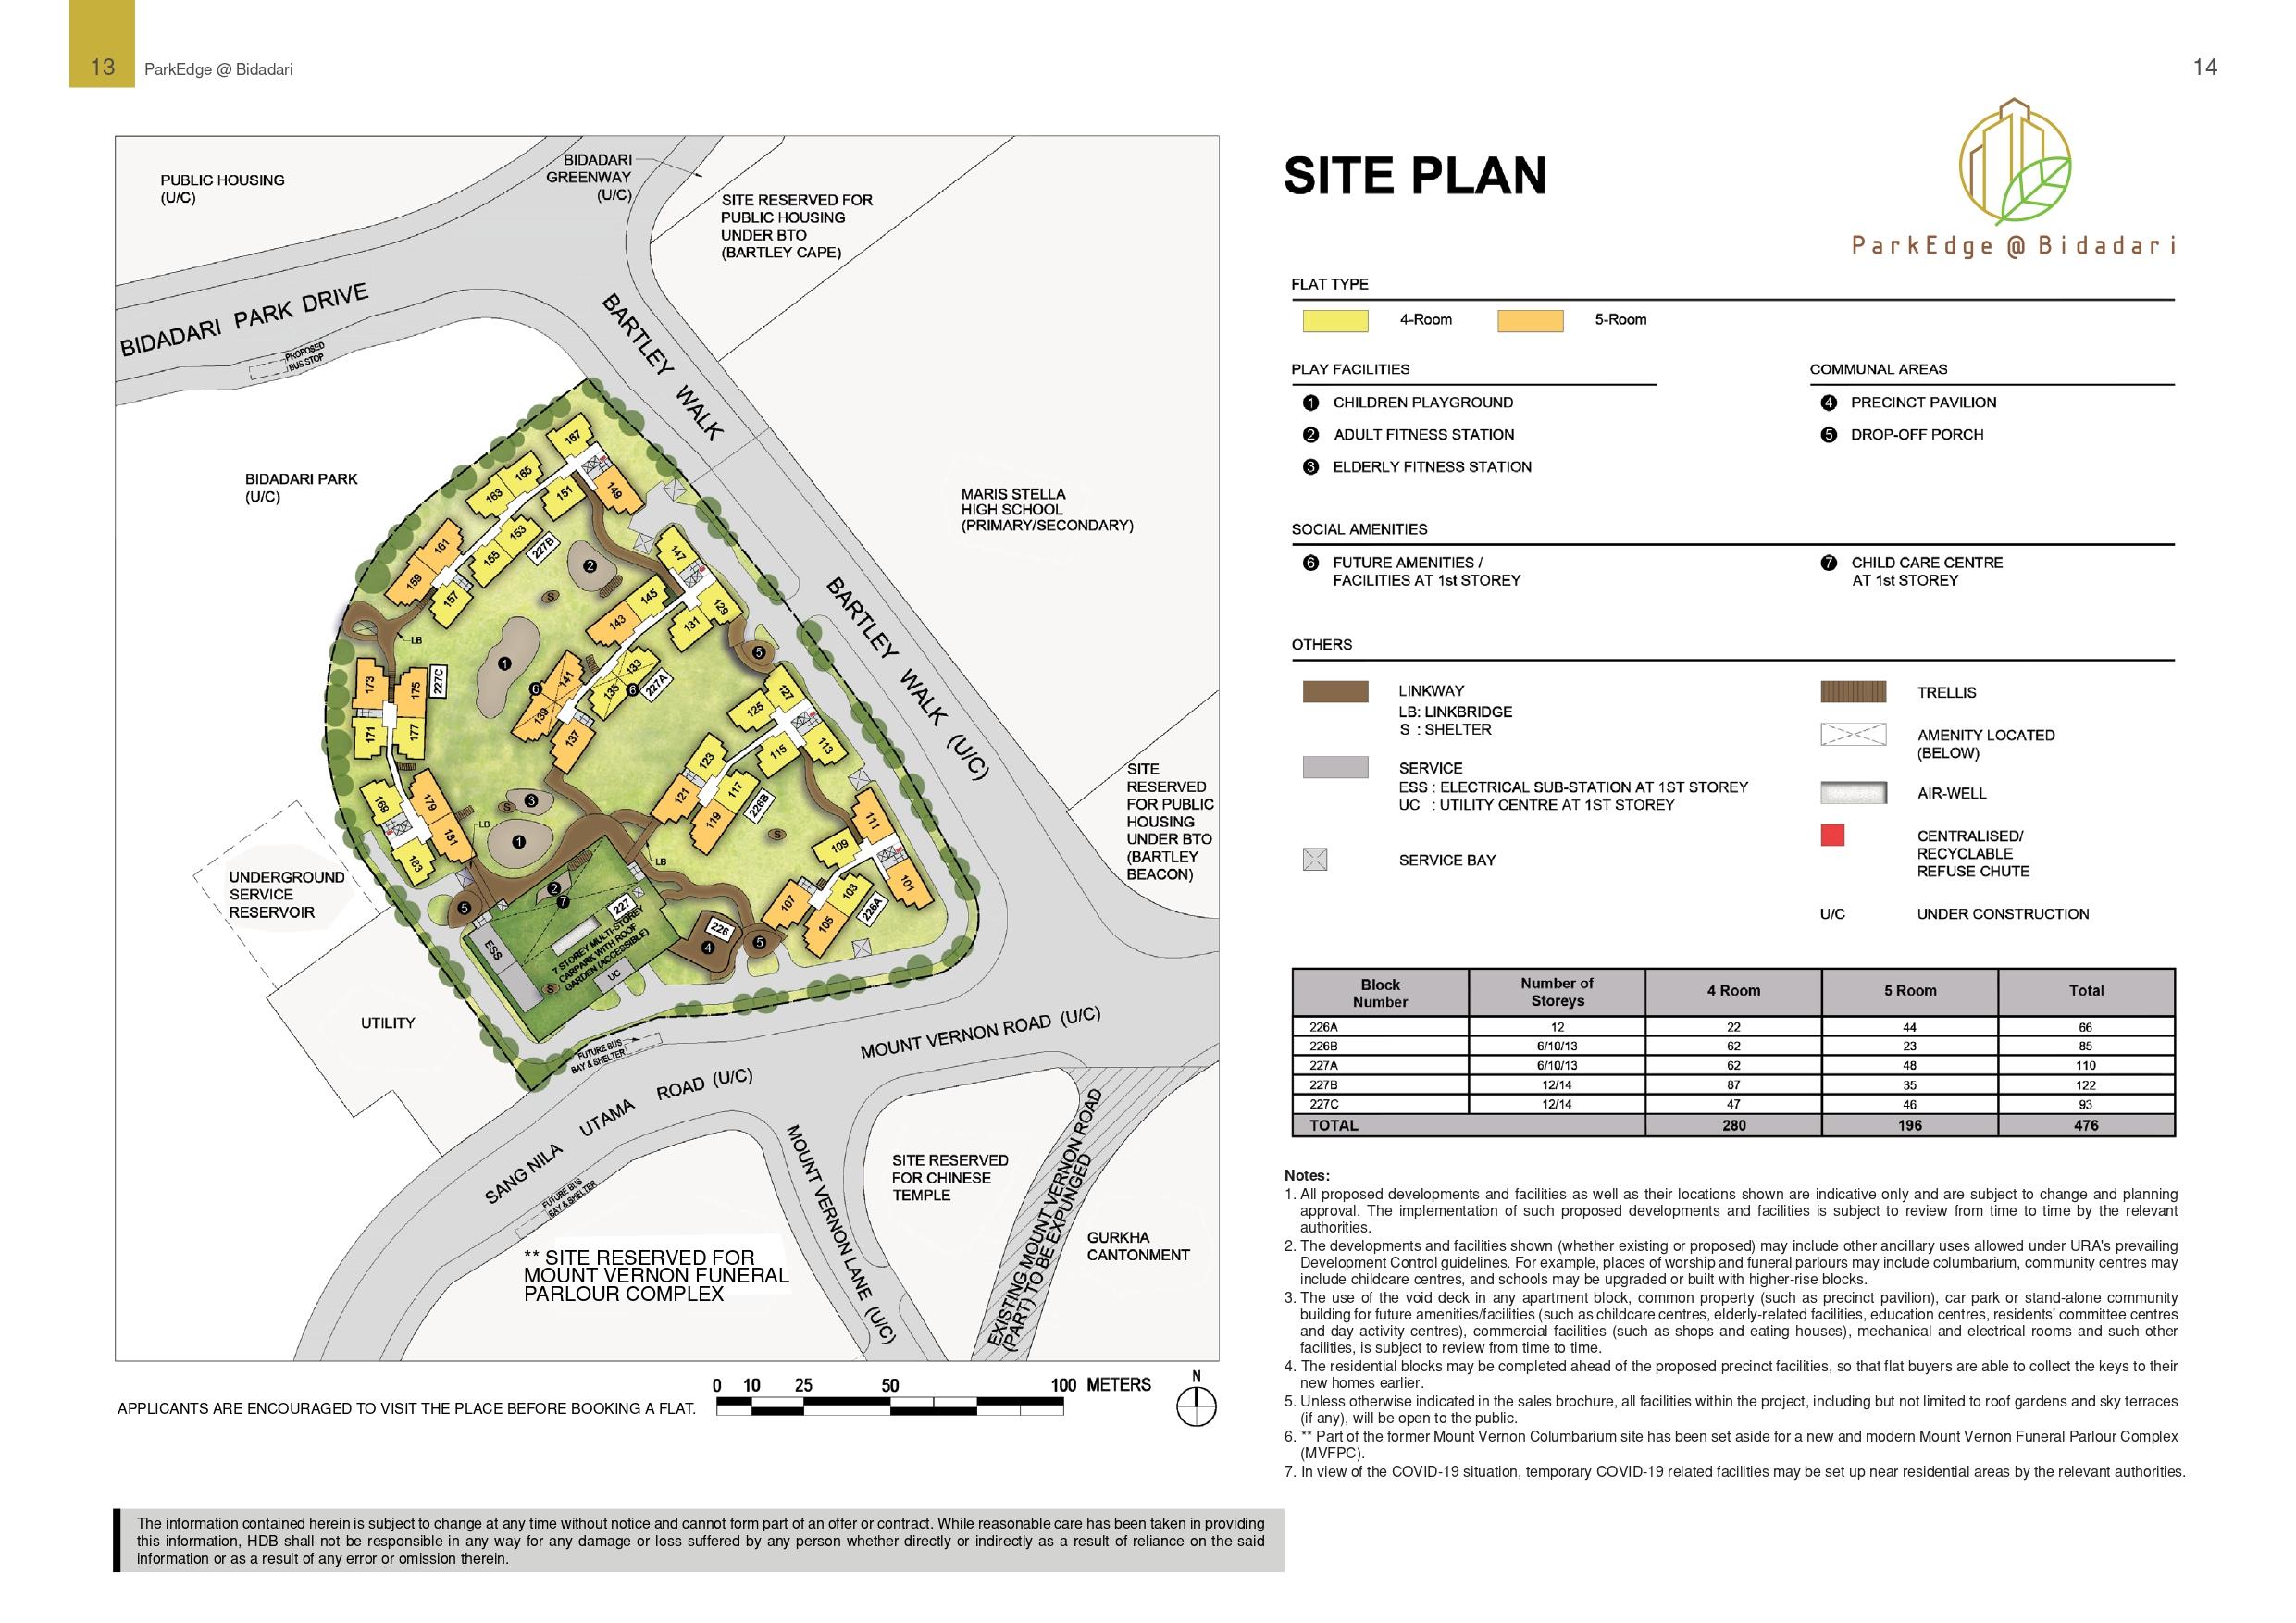 ParkEdge @ Bidadari Site Plan